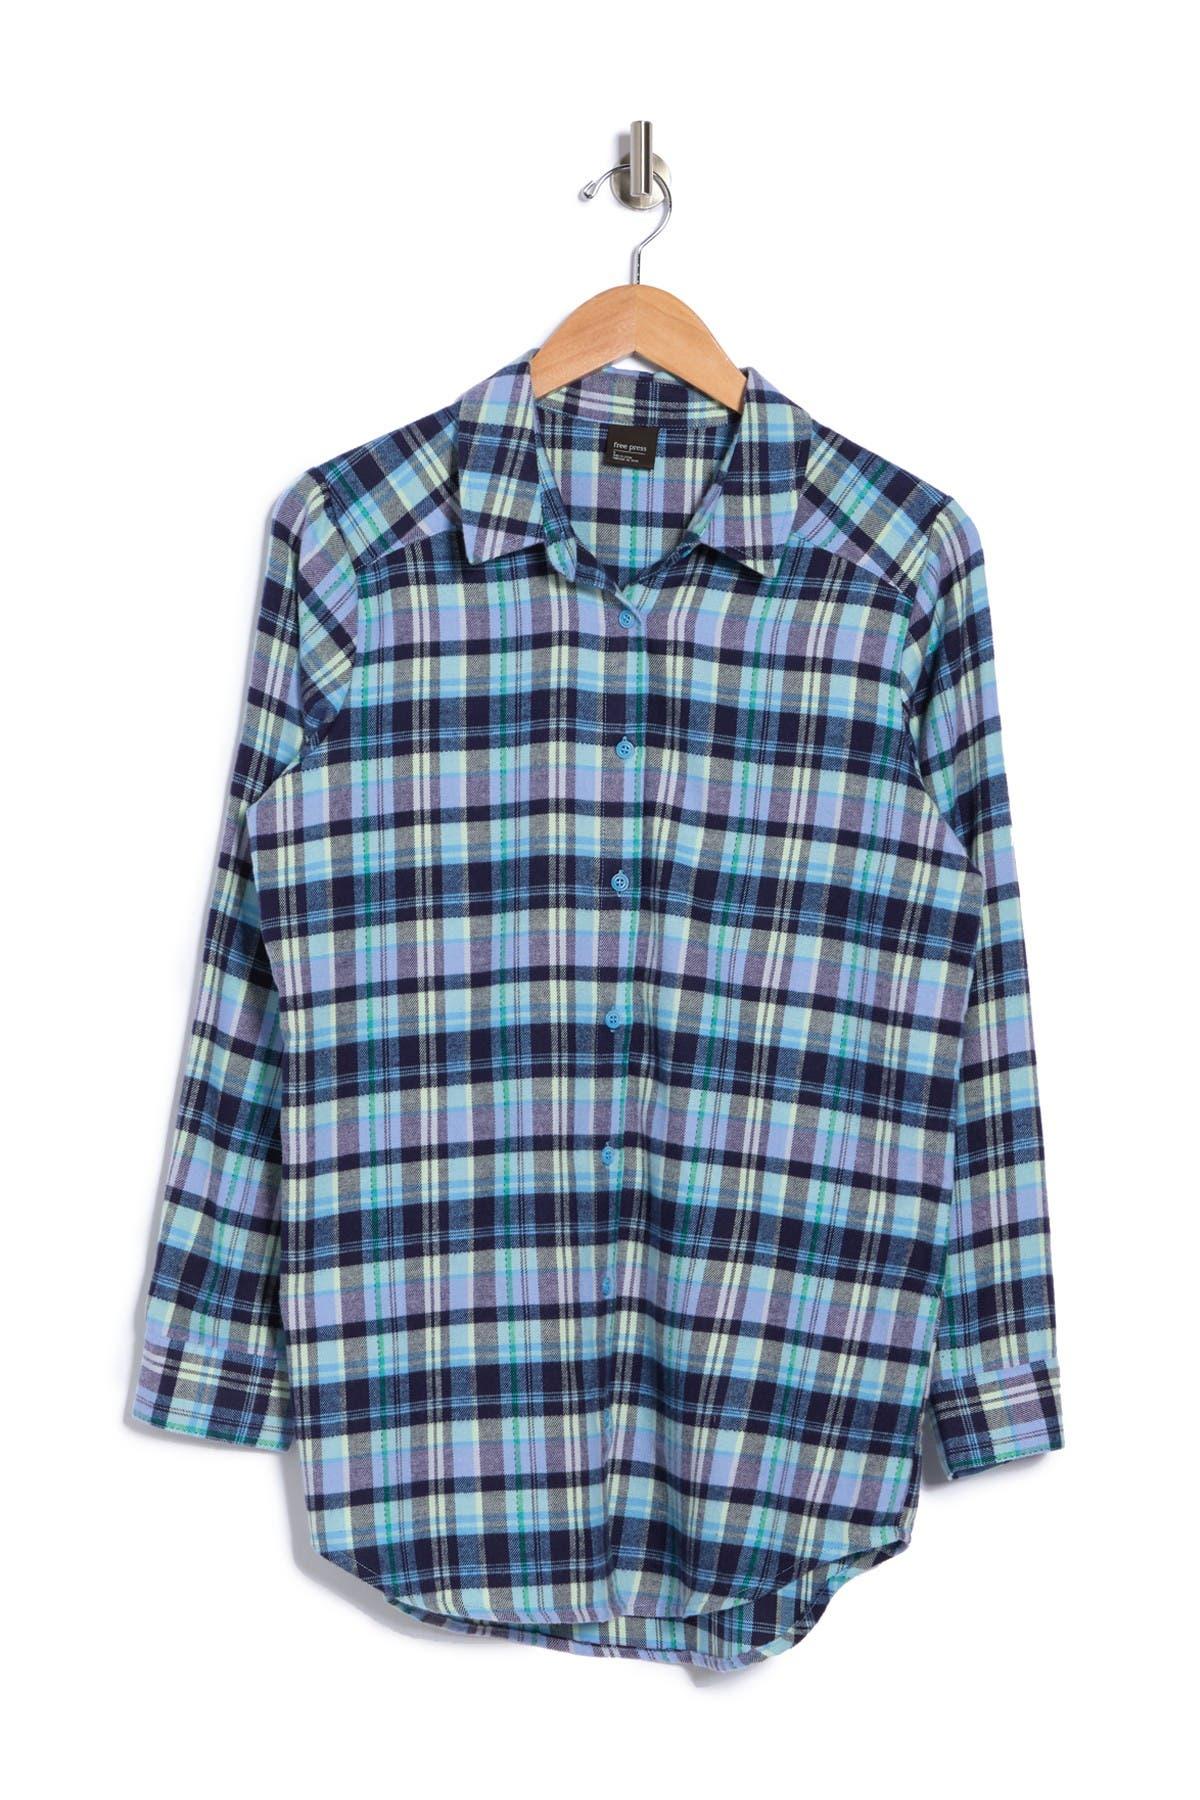 Free Press Flannel Nightshirt